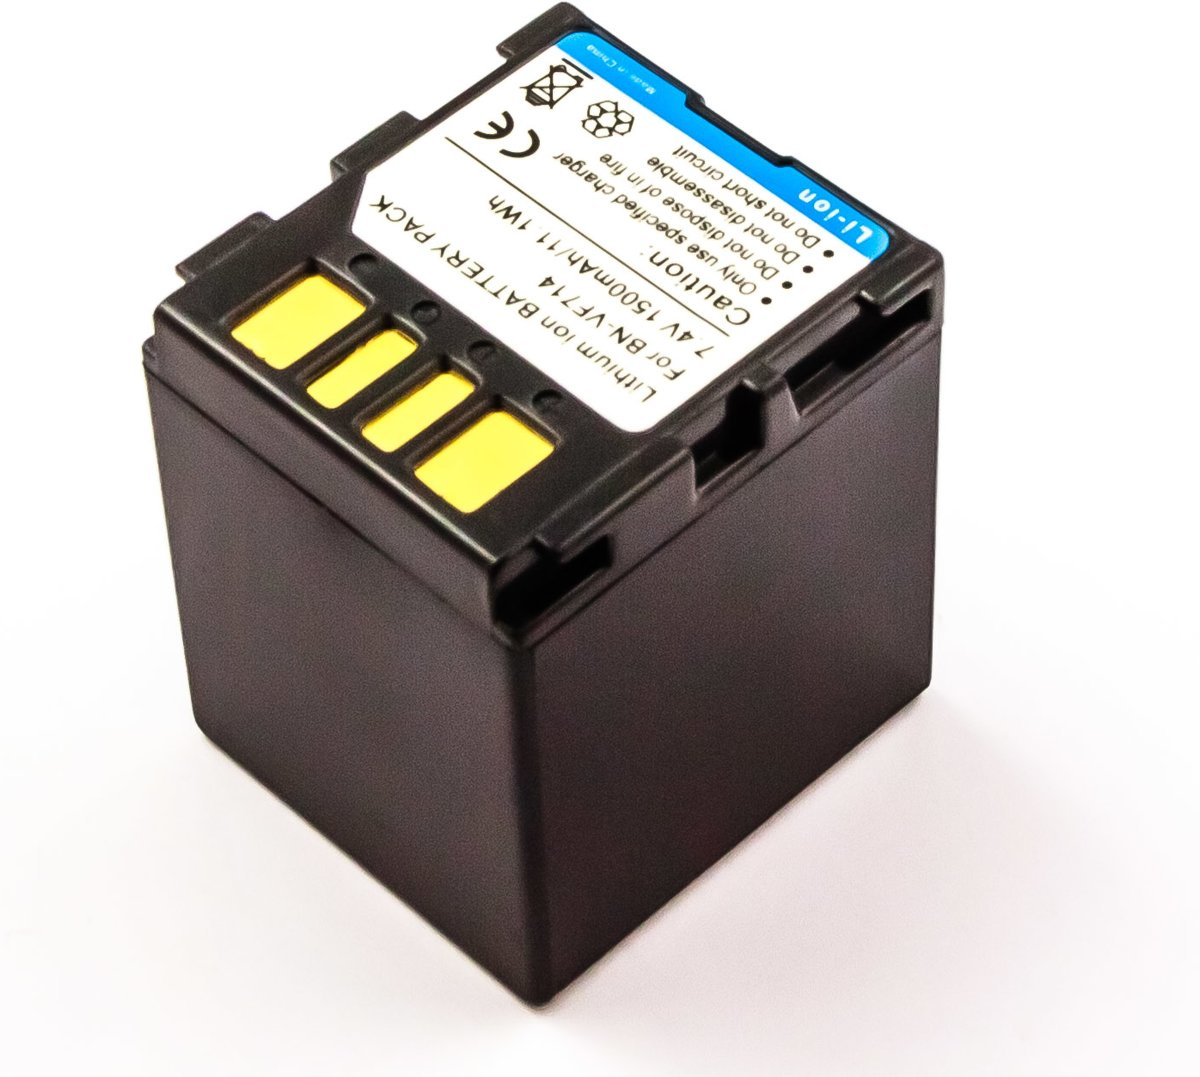 Afbeelding van Wholeshare Battery similar JVC BN-VF714, Li-ion, 7,4V, 1500mAh, 11,1Wh